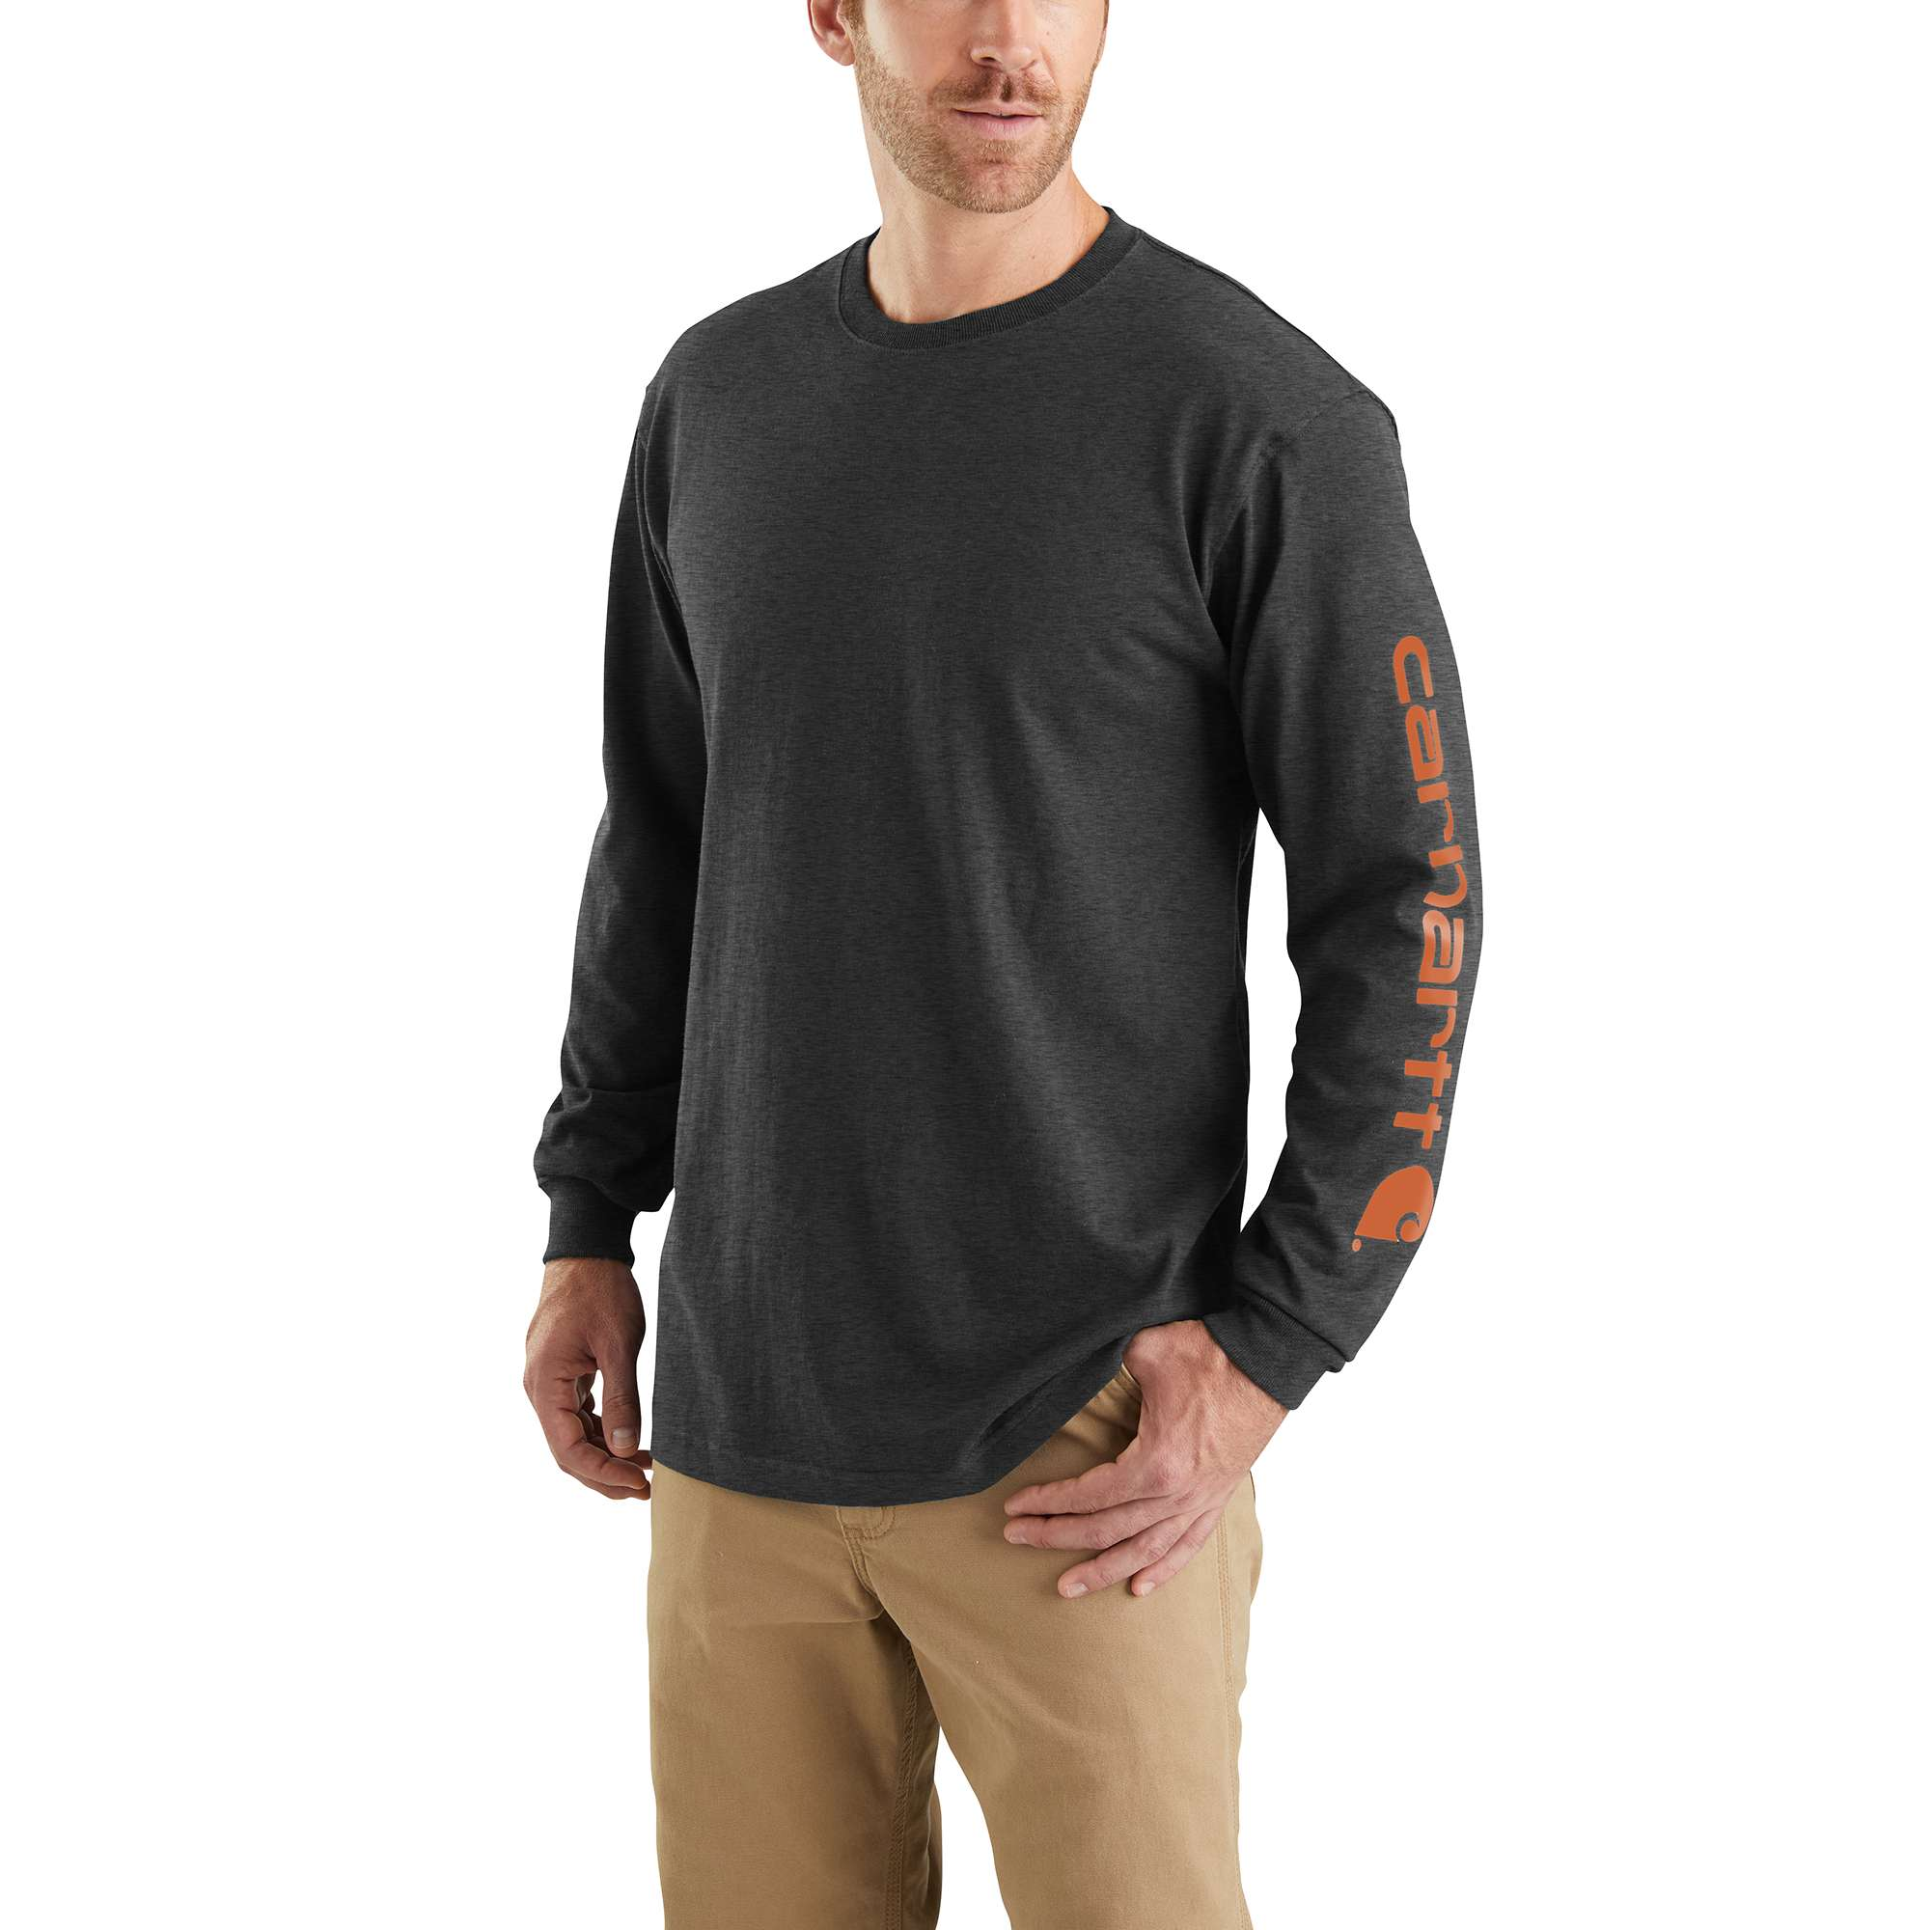 Men's Workwear Long-Sleeve Graphic Logo T-Shirt, Gray, swatch